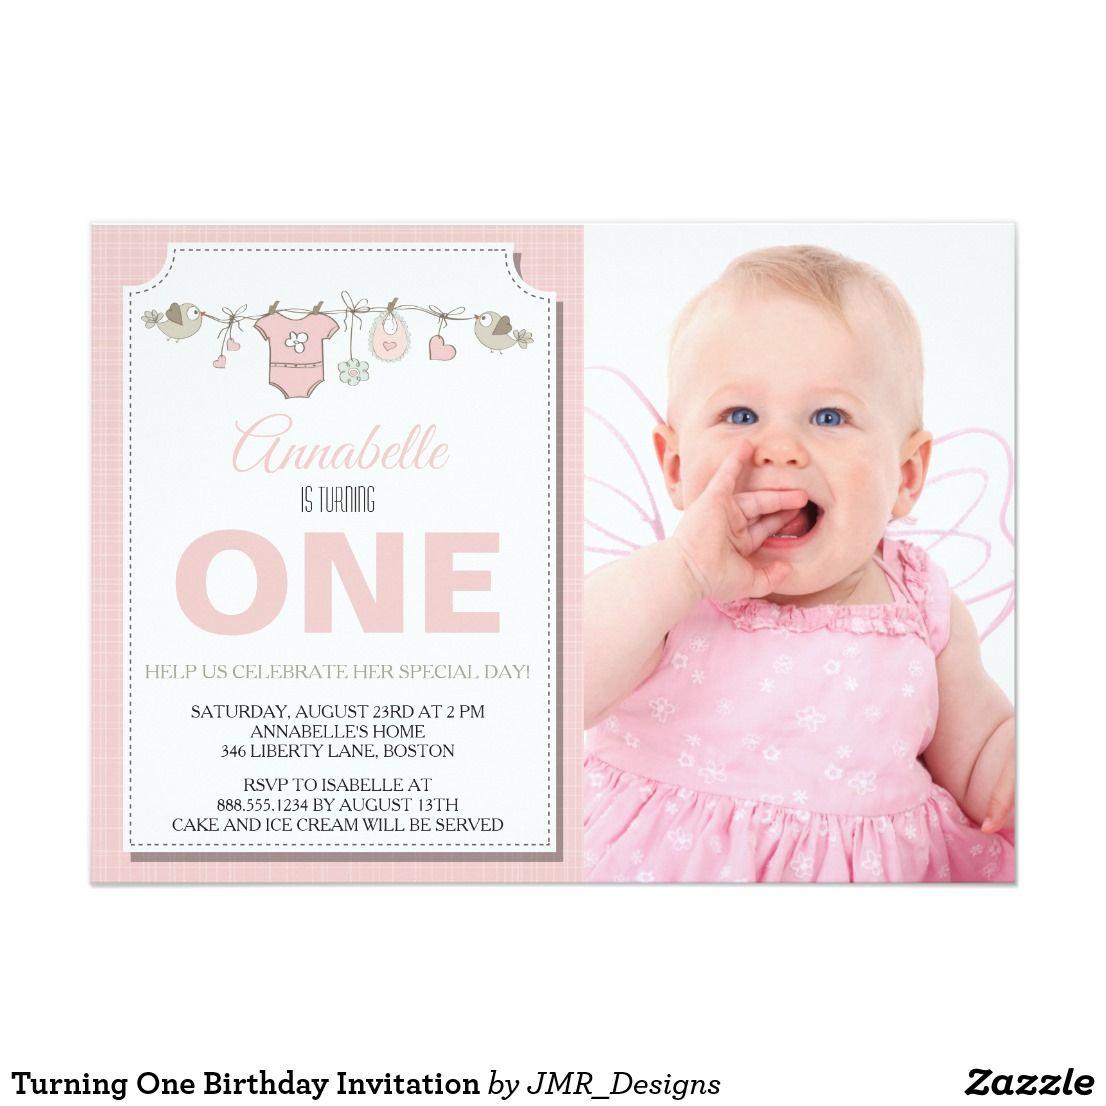 Turning One Birthday Invitation | Baby and Kids Ideas | Pinterest